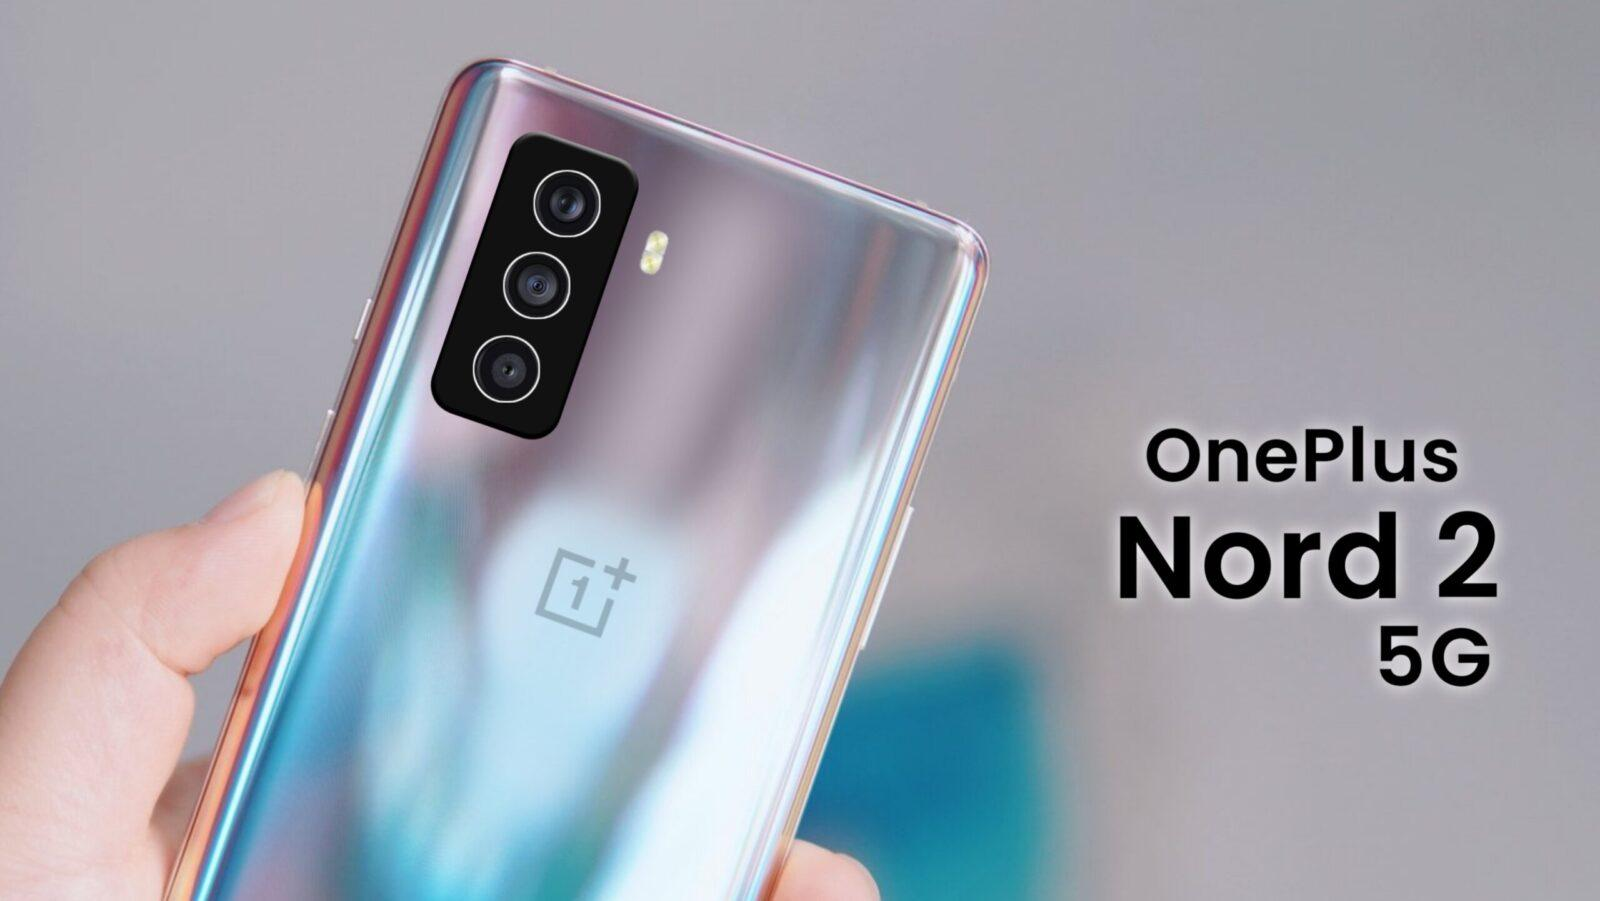 OnePlus Nord 2 выйдет во втором квартале 2021 года с флагманским чипсетом MediaTek (20200801 155454 scaled)